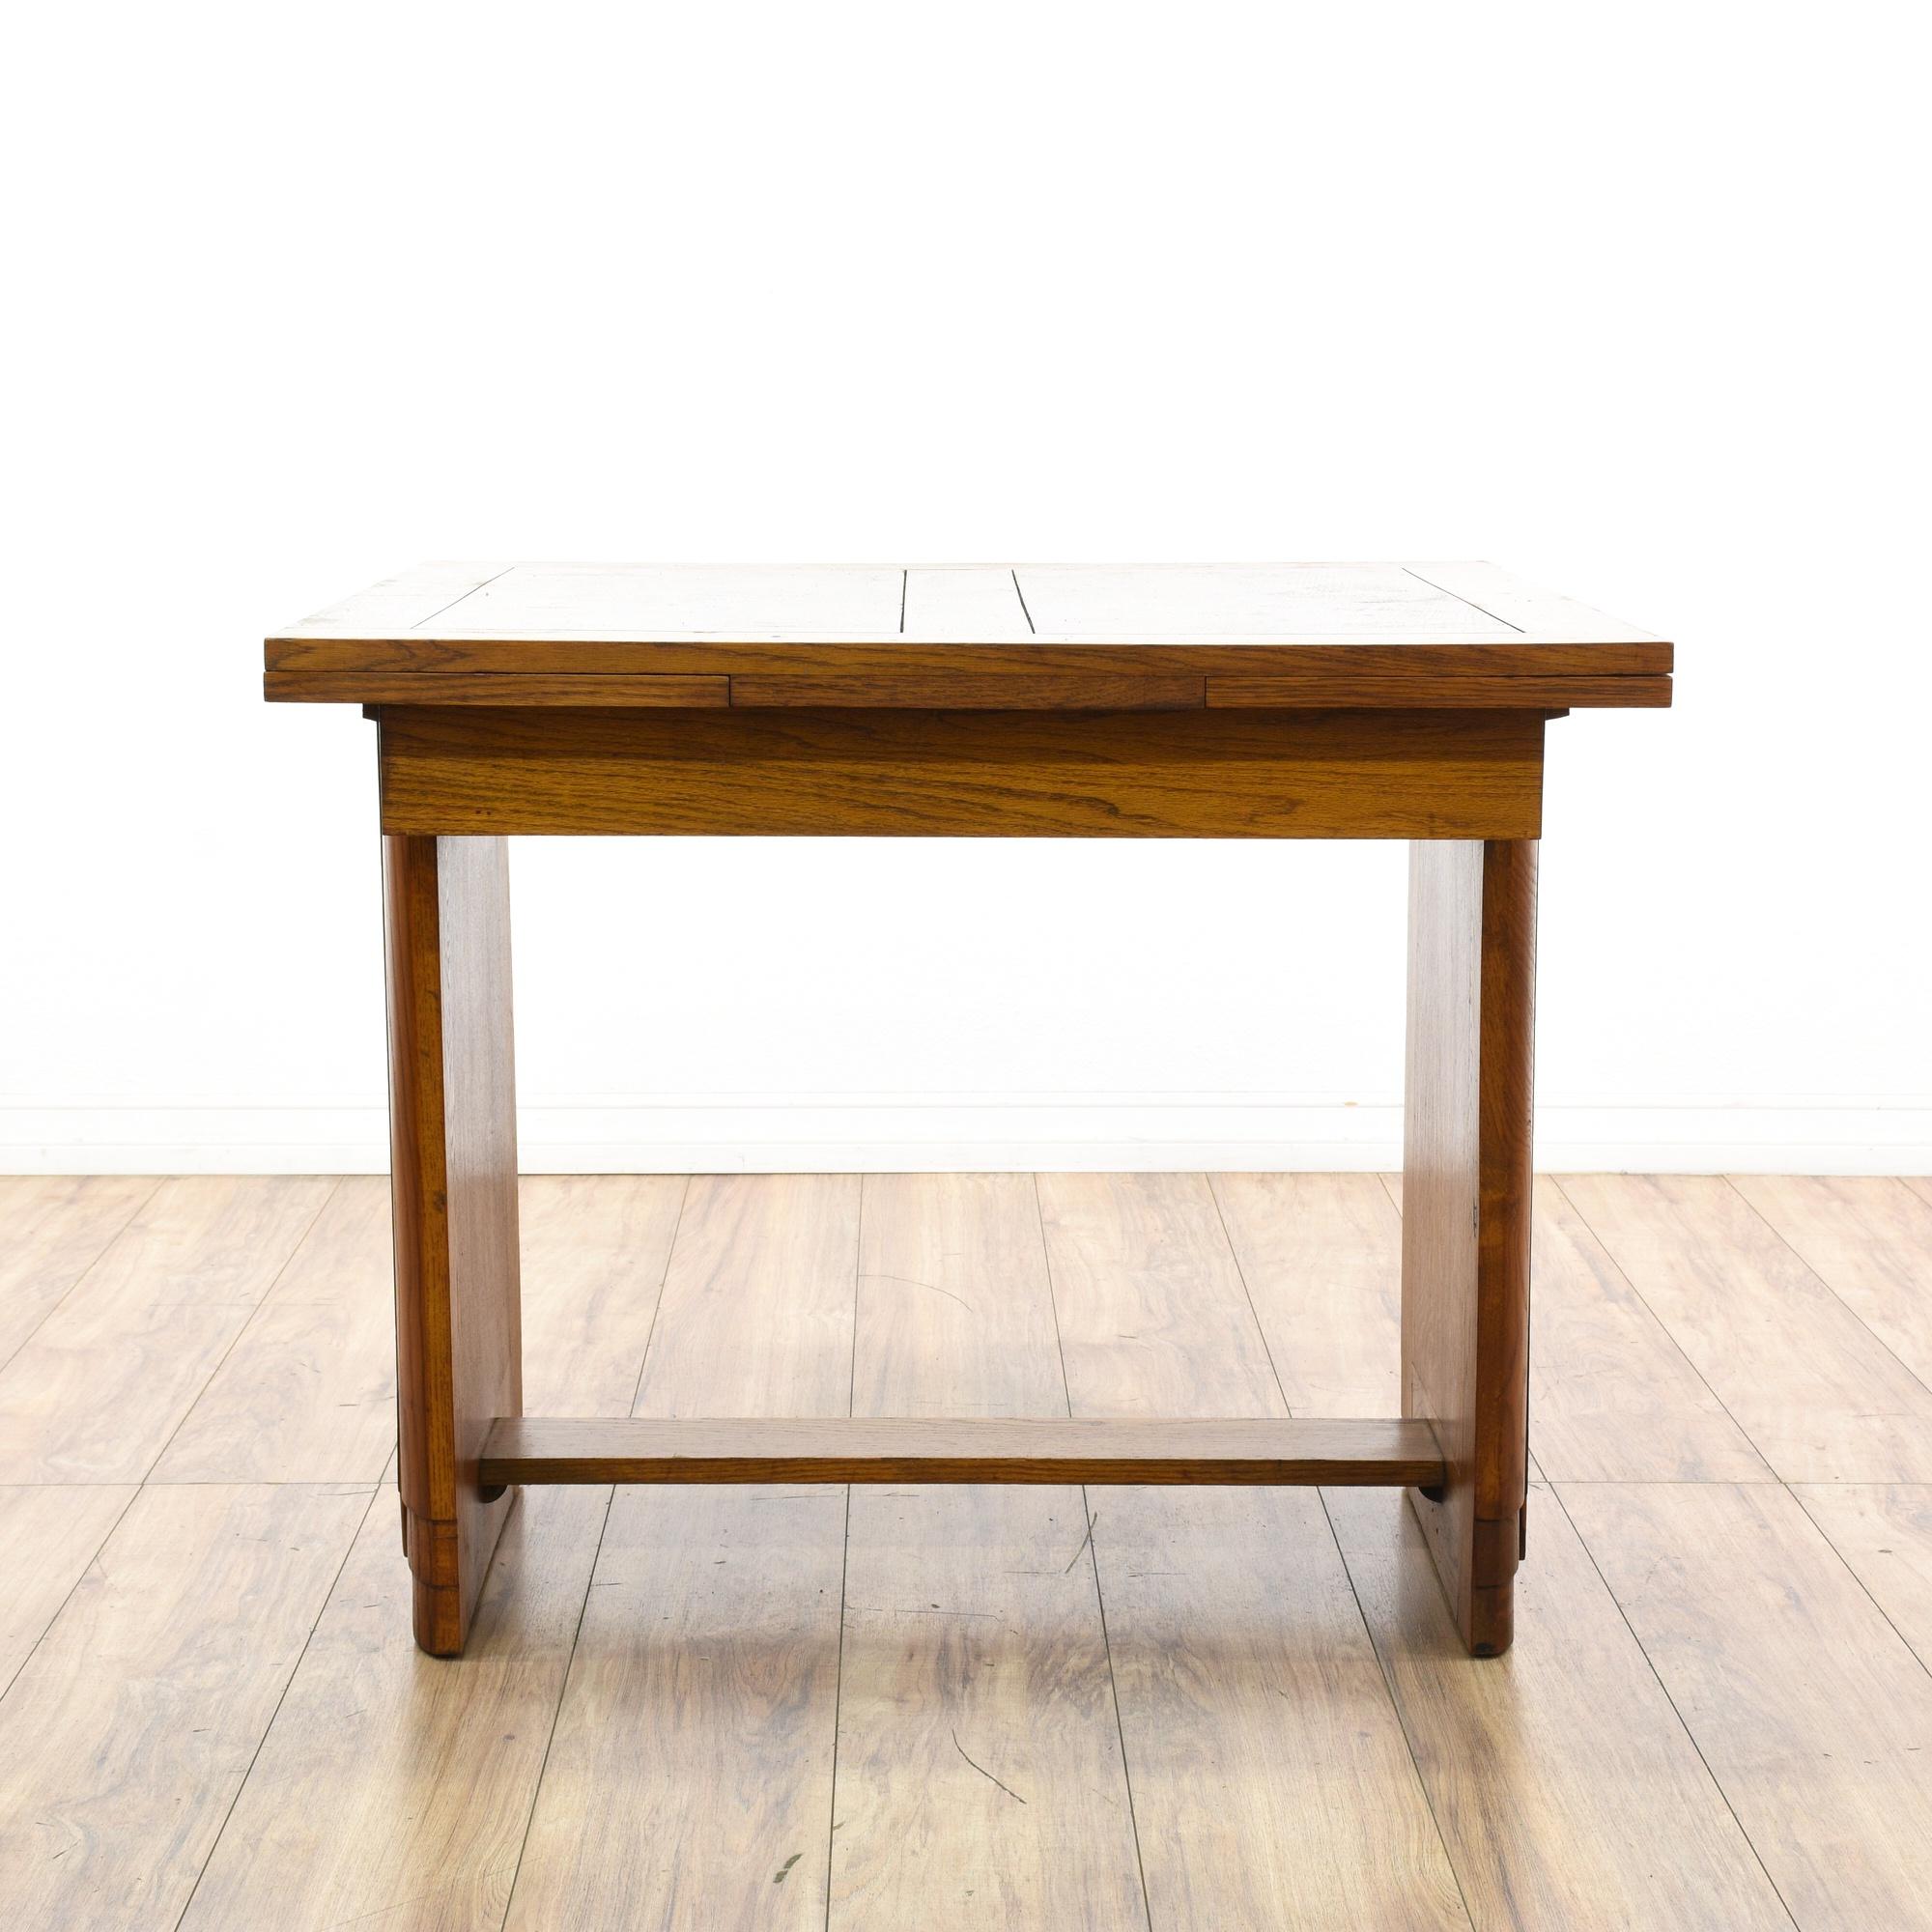 san diego furniture - craigslist